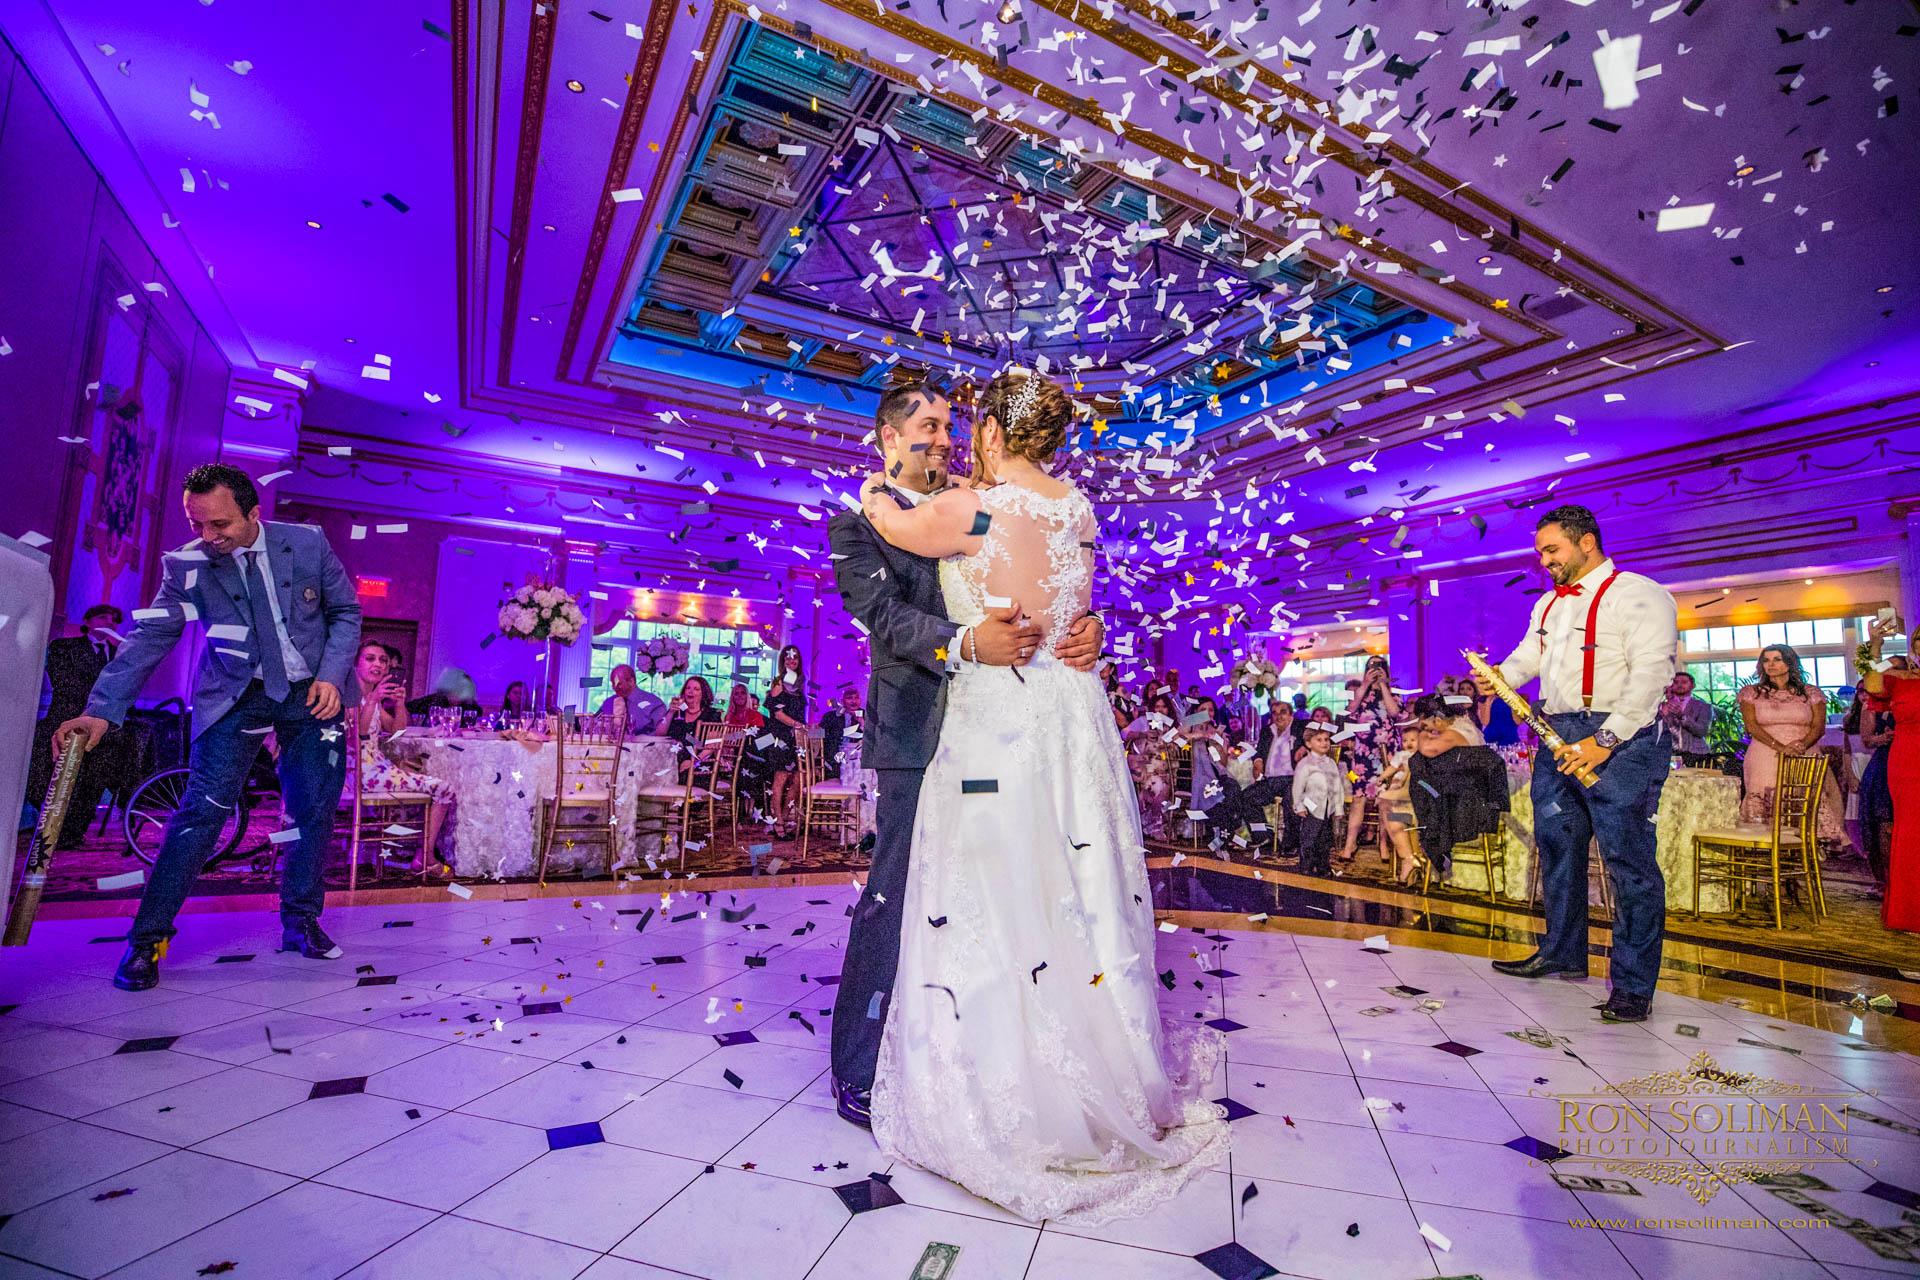 ADELPHIA RESTAURANT WEDDING 22